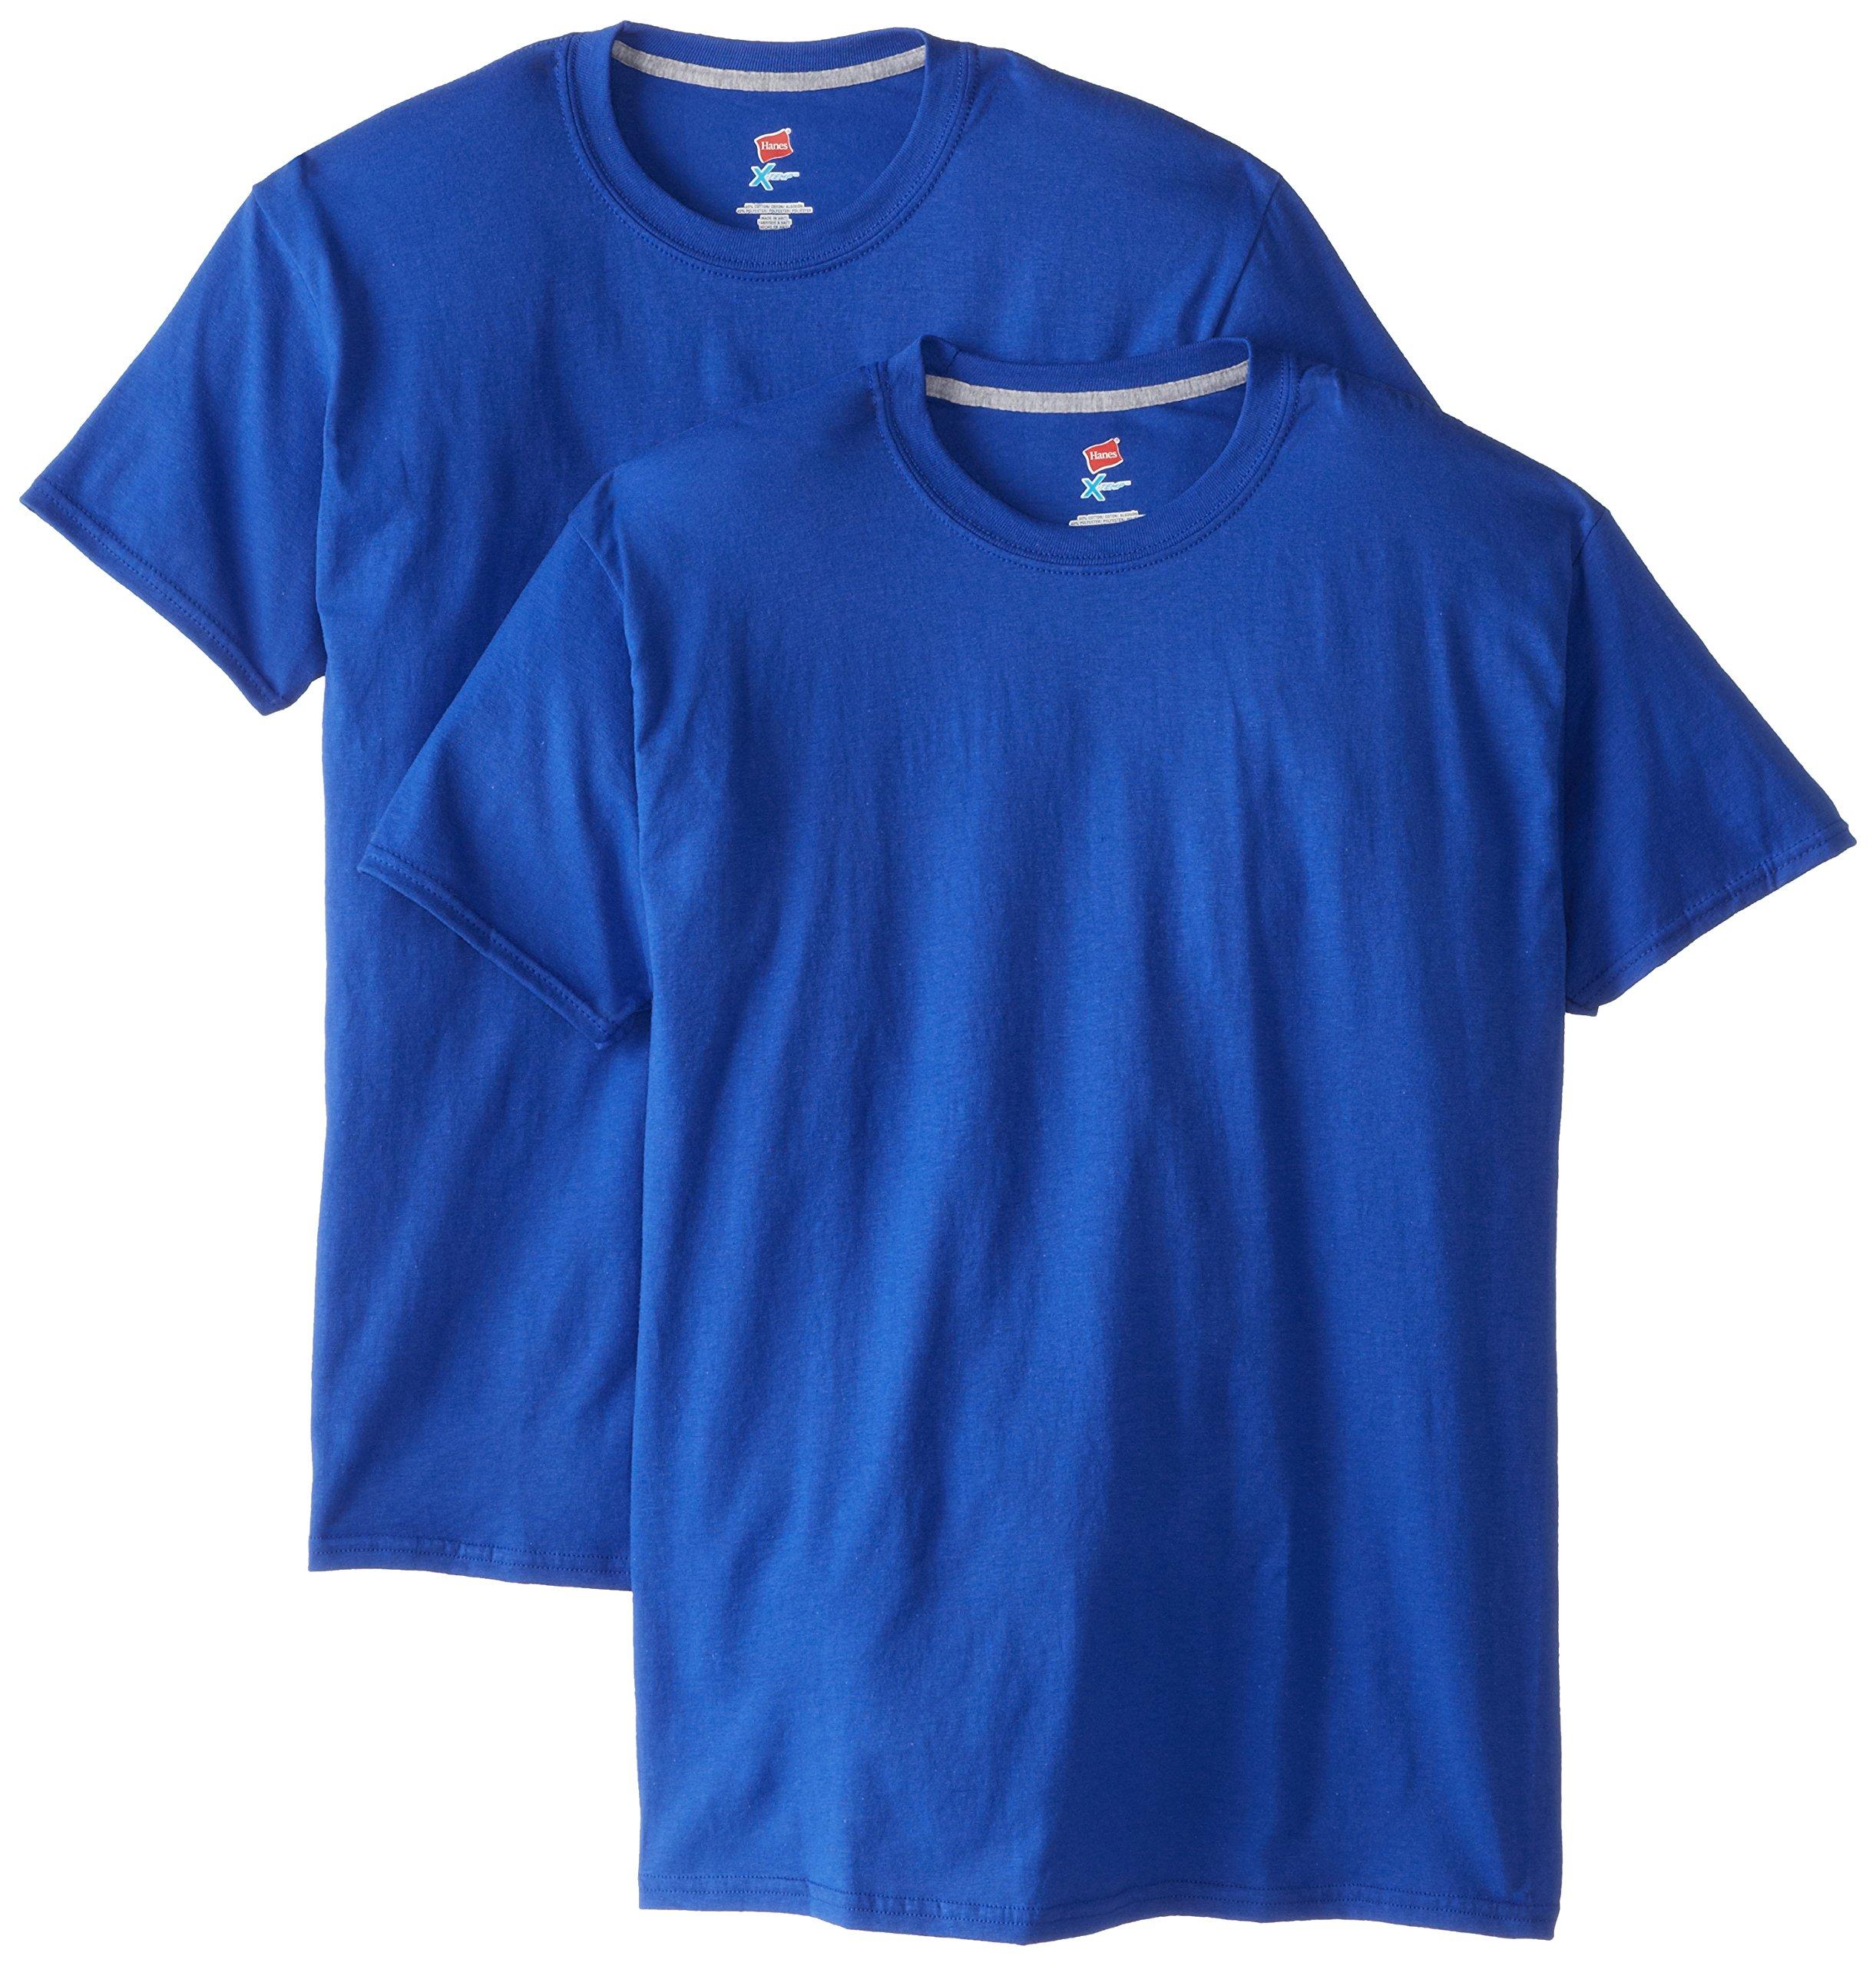 Hanes Men's 2 Pack X-Temp Performance T-Shirt, Deep Royal, Large